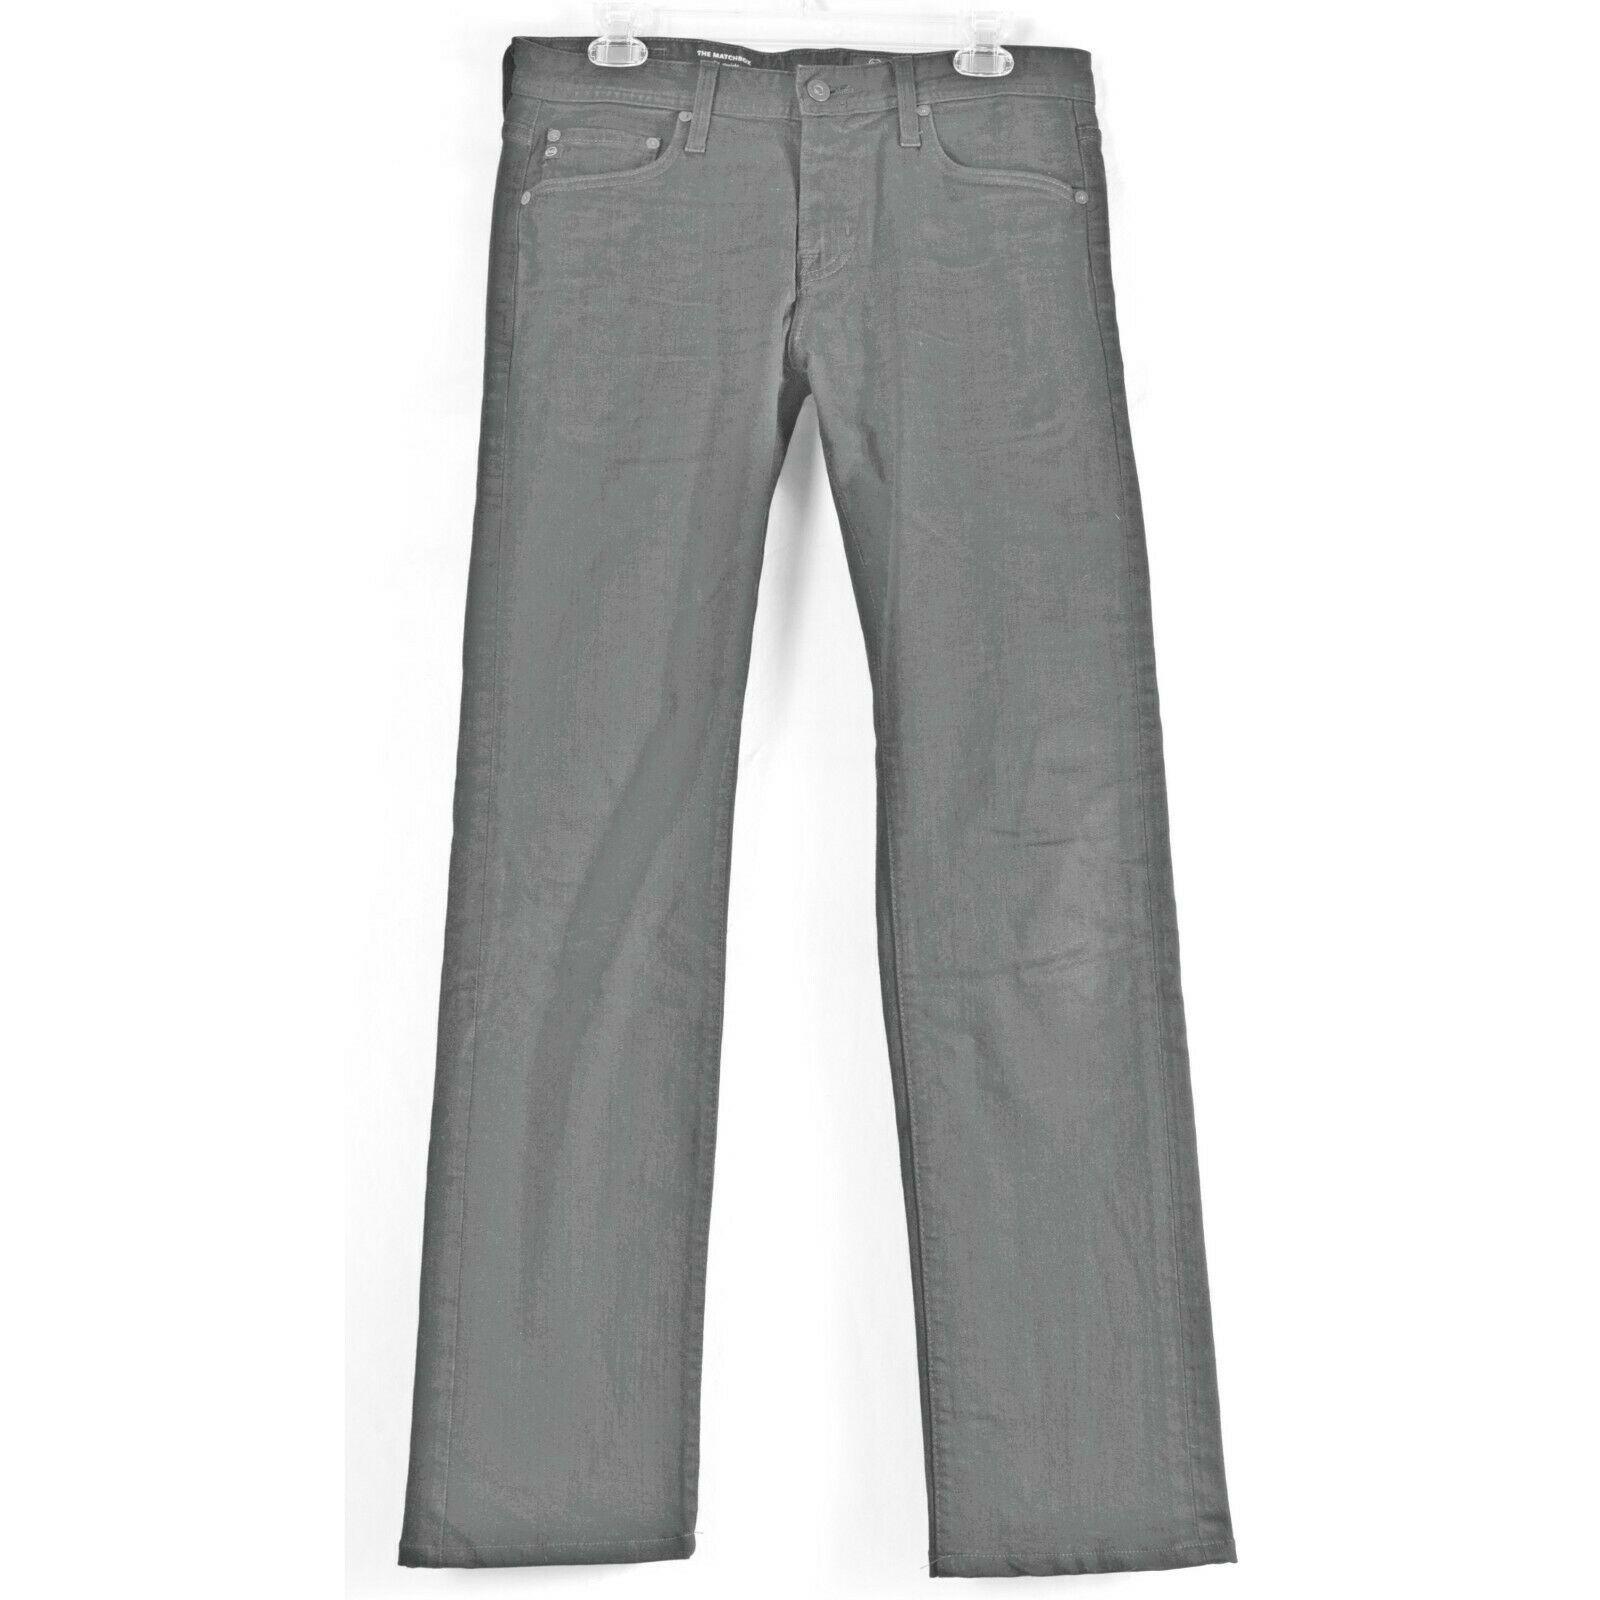 AG Adriano Goldschmied jeans 30 x 34 men Matchbox dark Slim Straight tall unique image 7